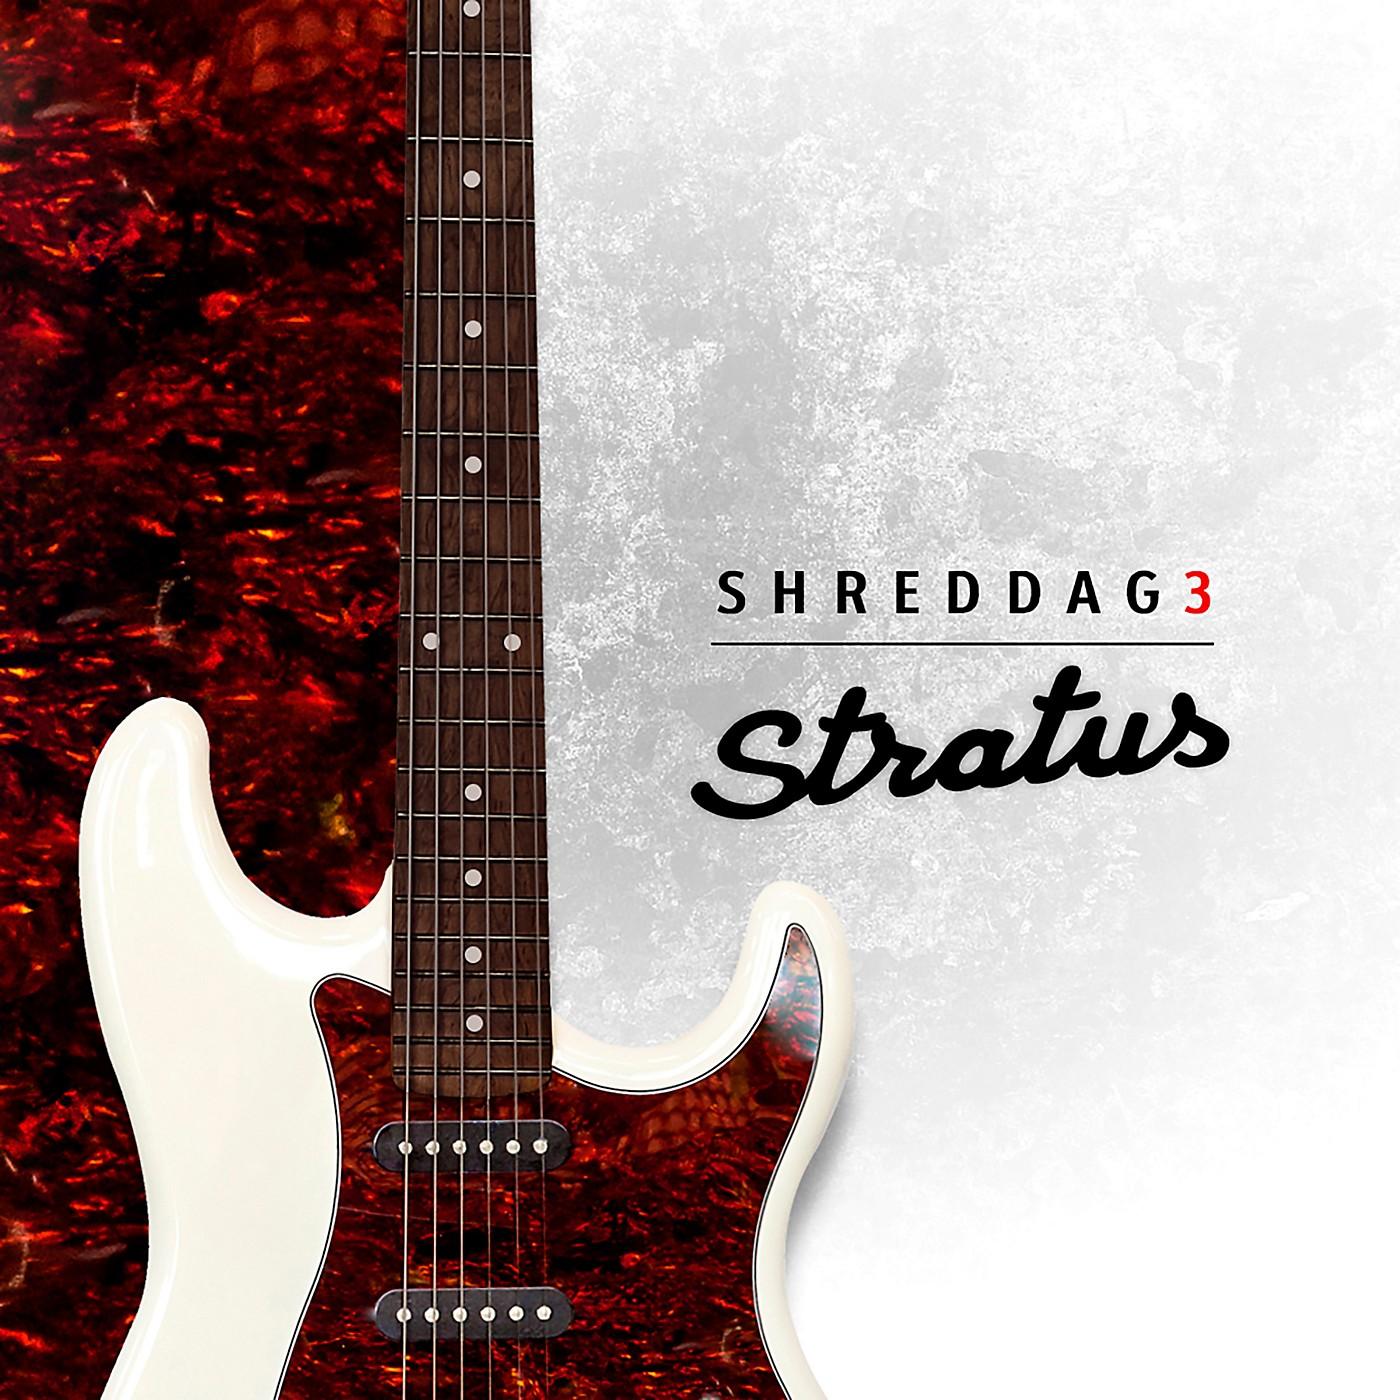 Impact Soundworks Shreddage 3 Stratus (Download) thumbnail